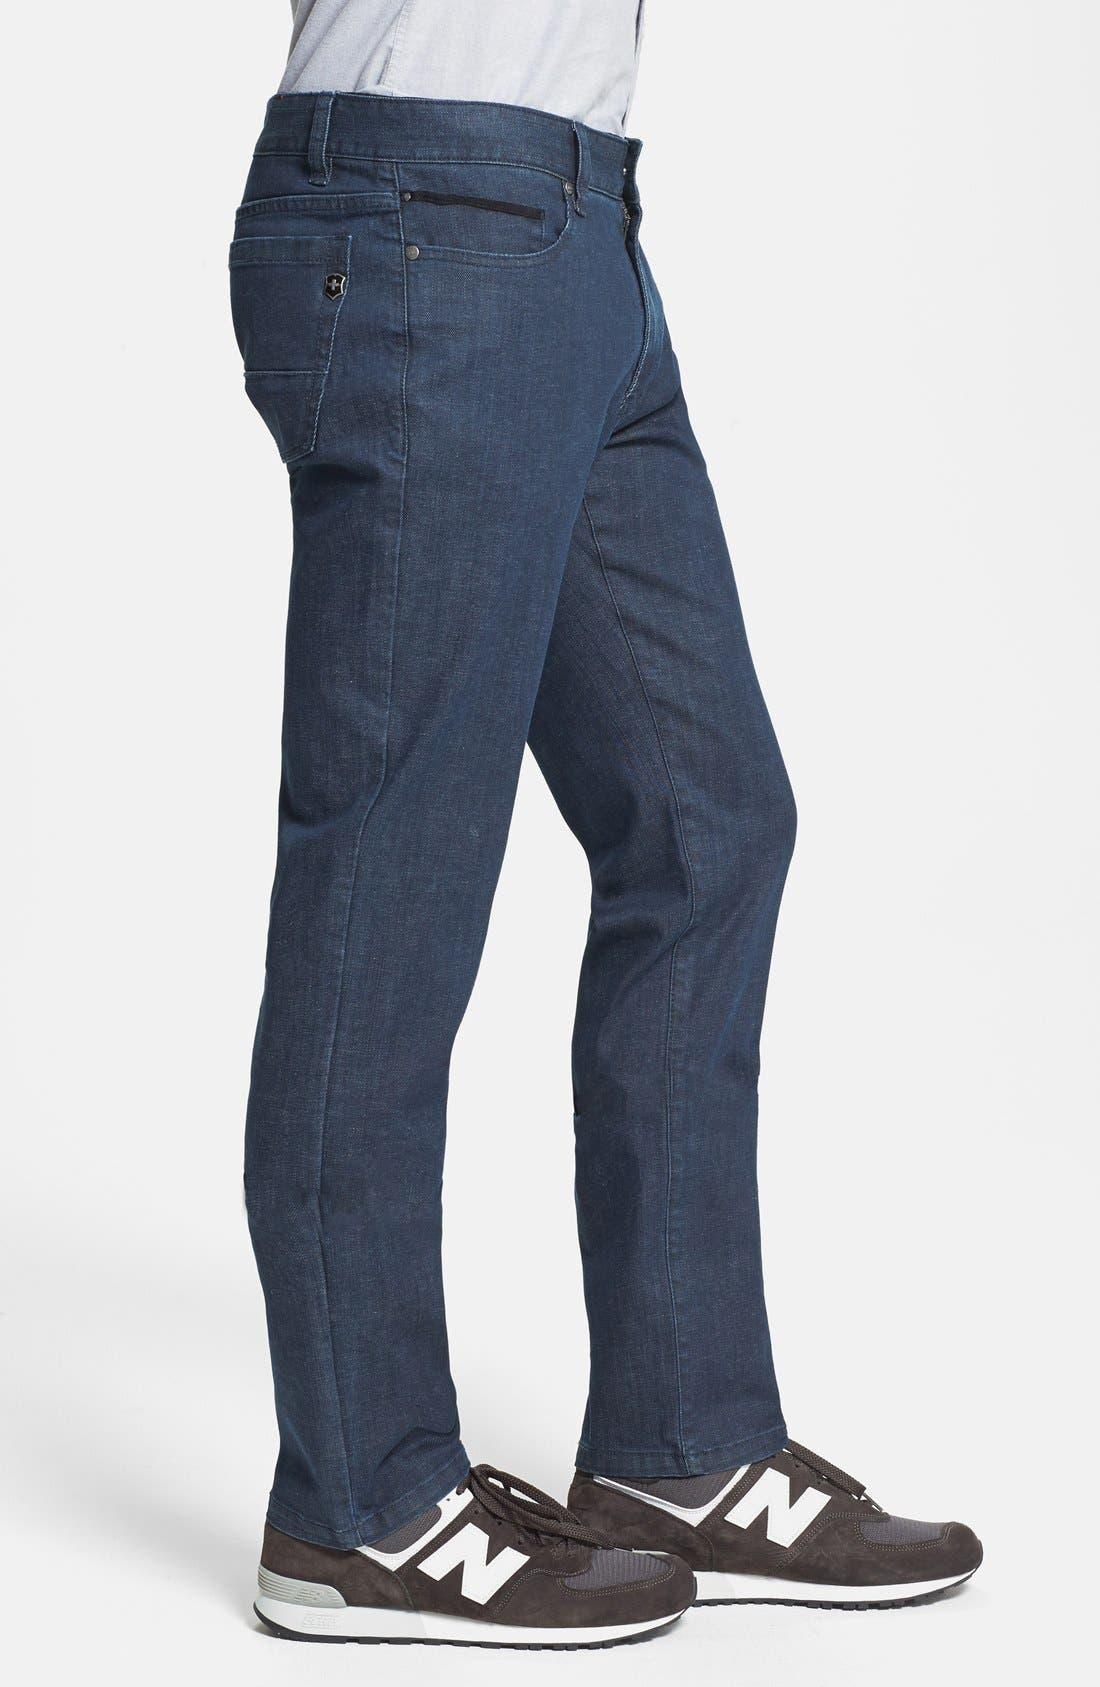 'Esher' Enzyme Wash Straight Leg Jeans,                             Alternate thumbnail 4, color,                             417